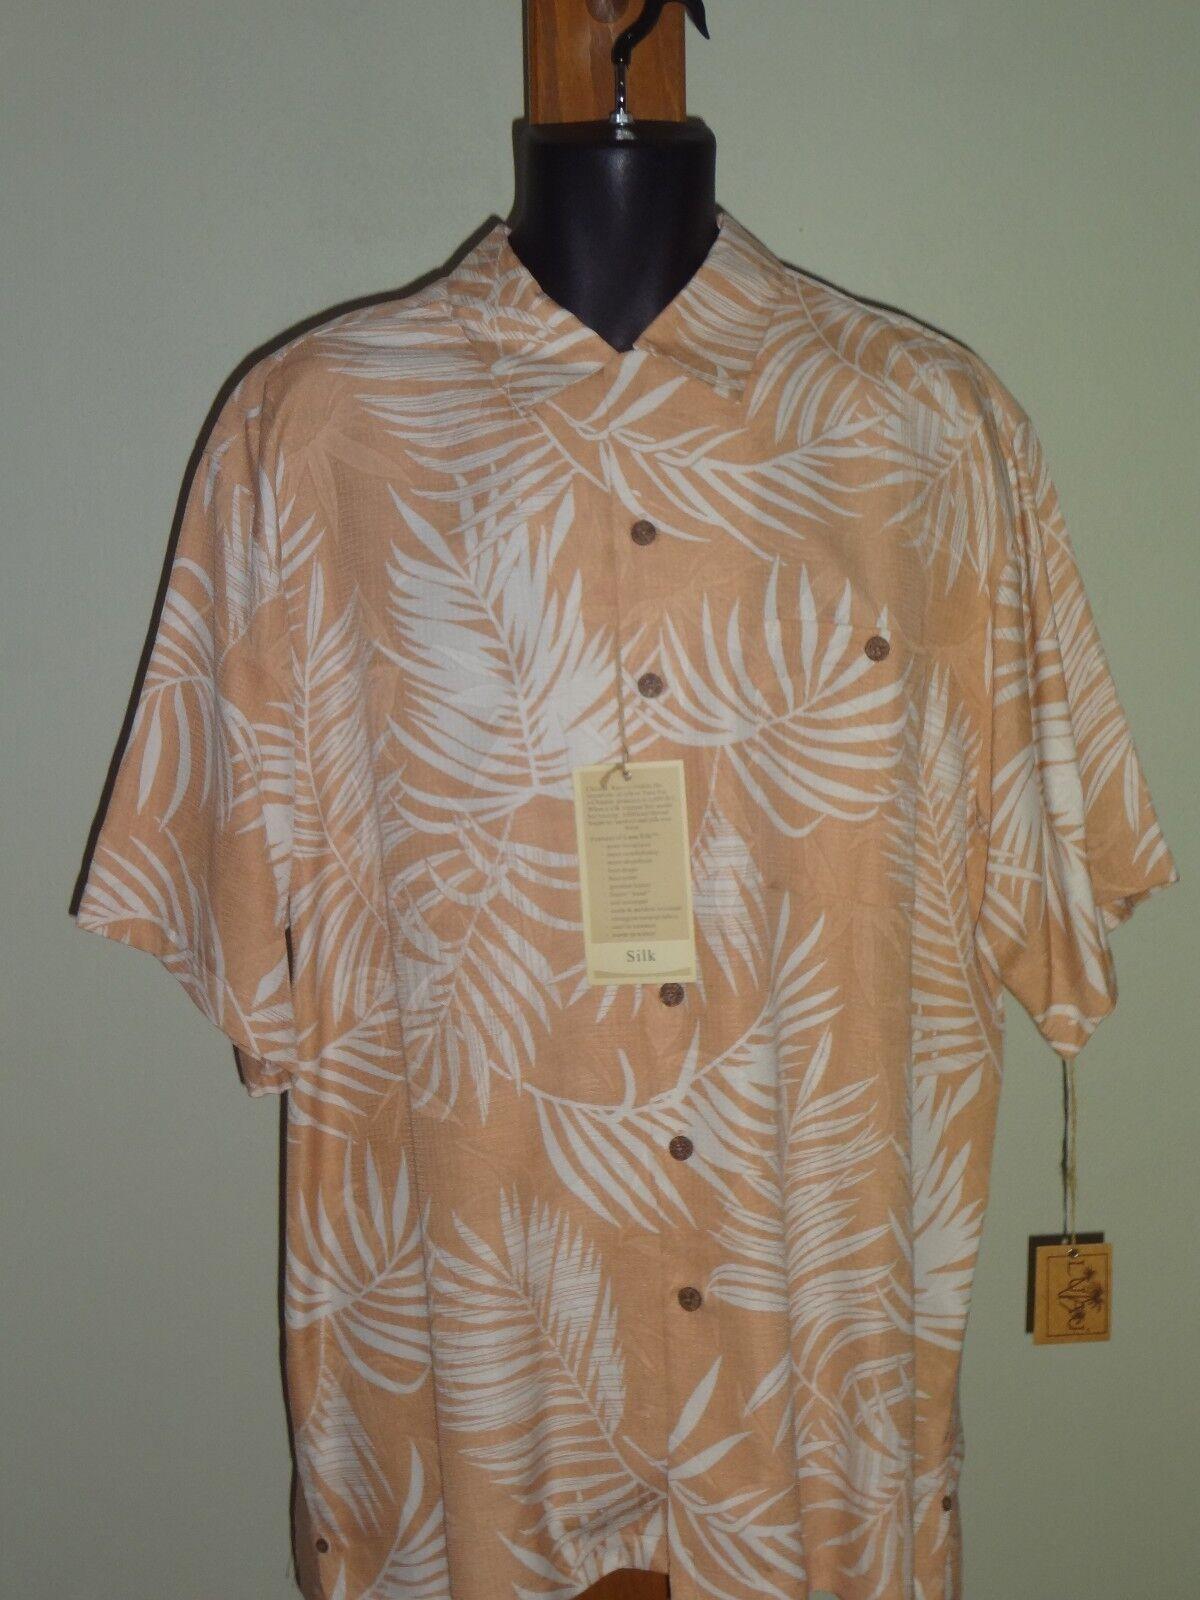 Luau 100% Silk Camp Shirt Size L color golden Tan